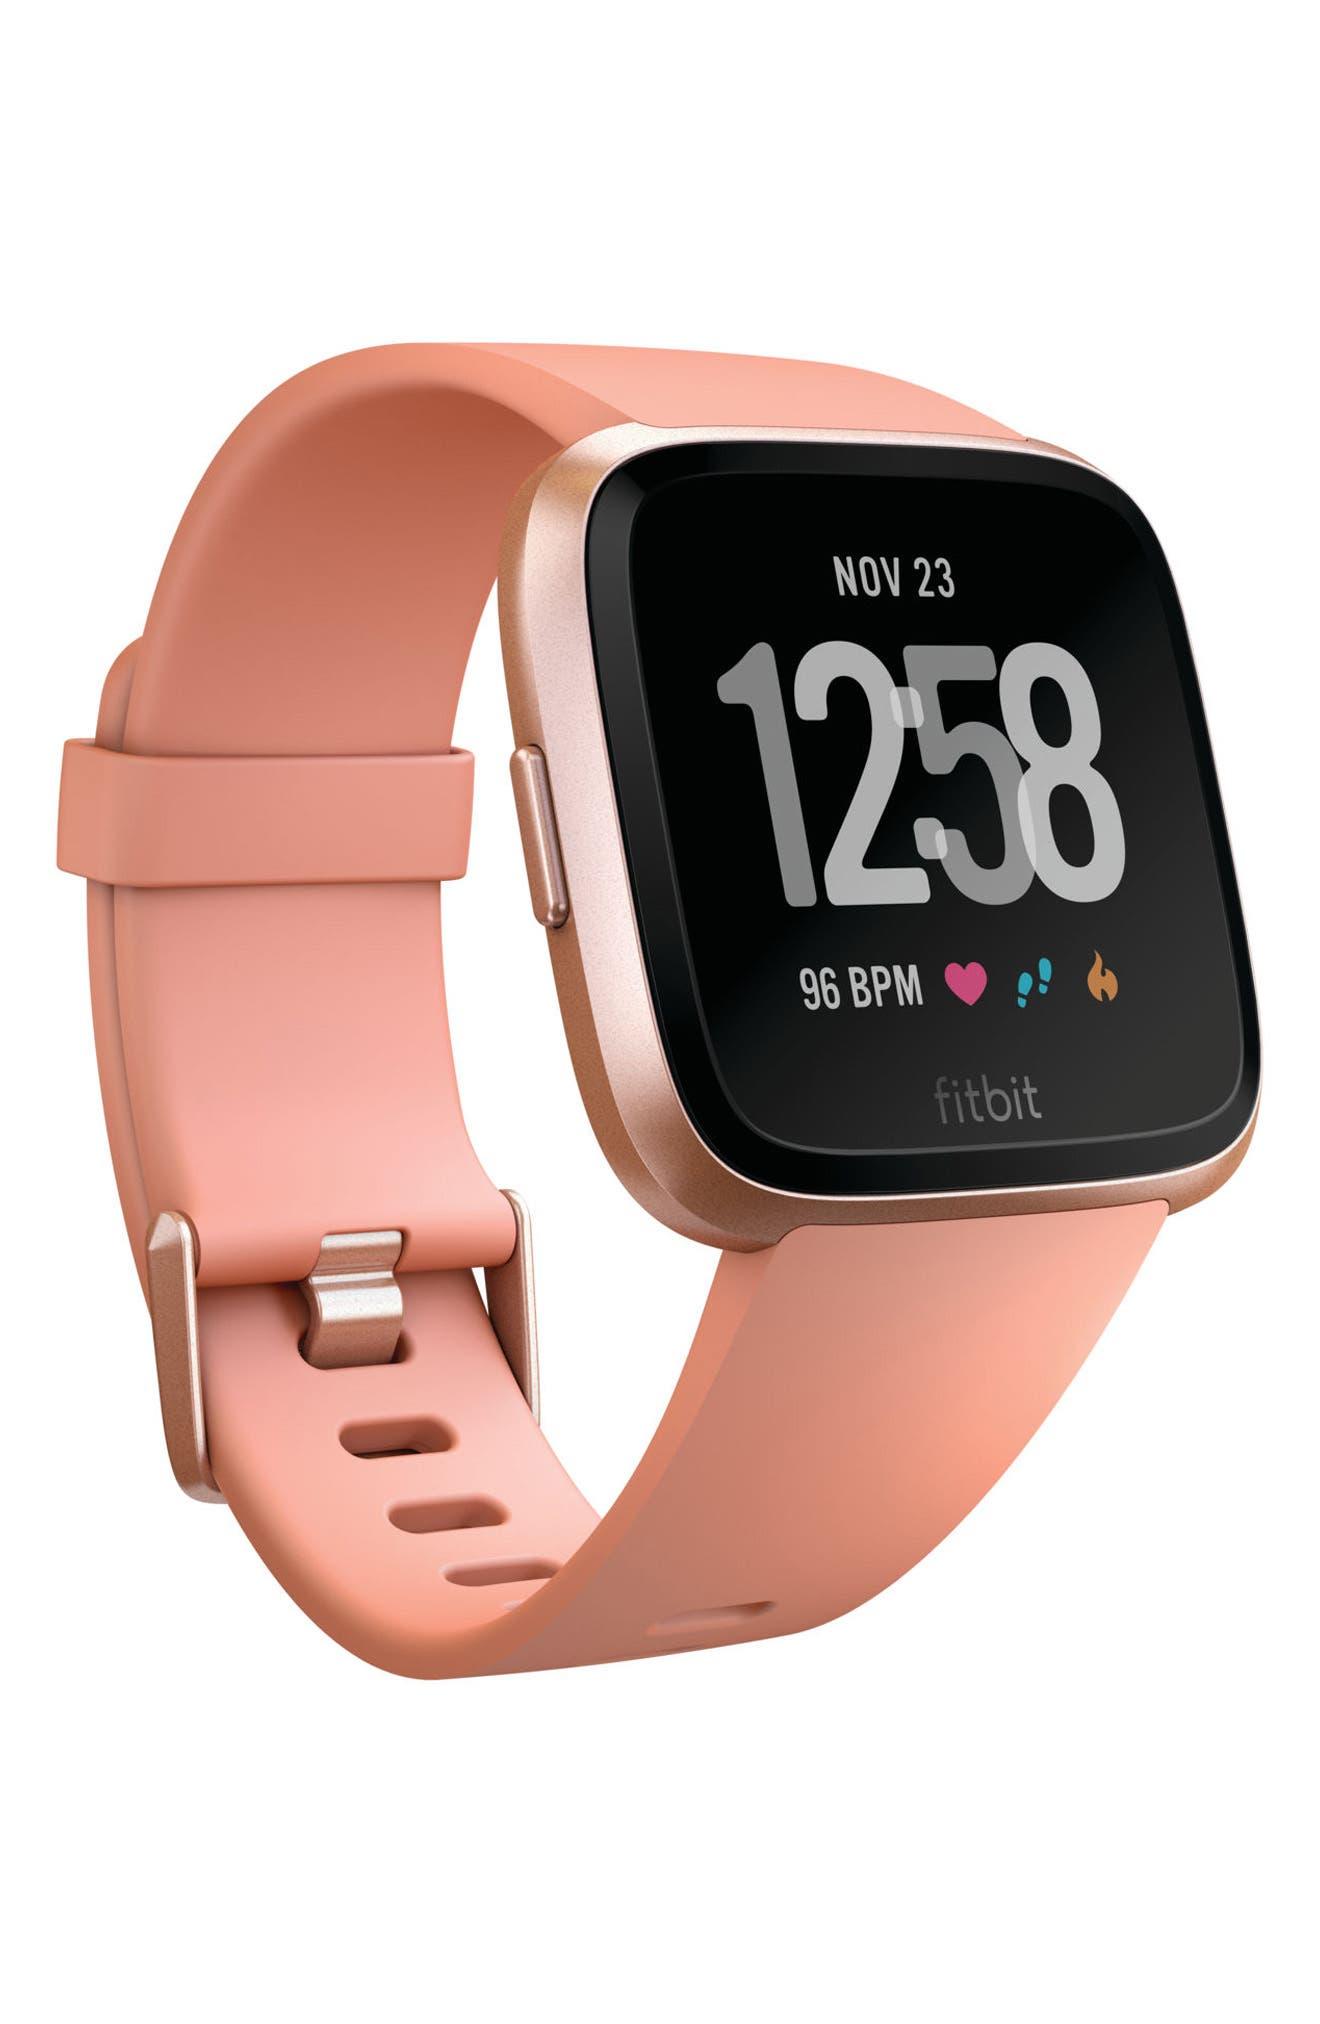 Image of Fitbit Versa Touchscreen Smartwatch, 34mm